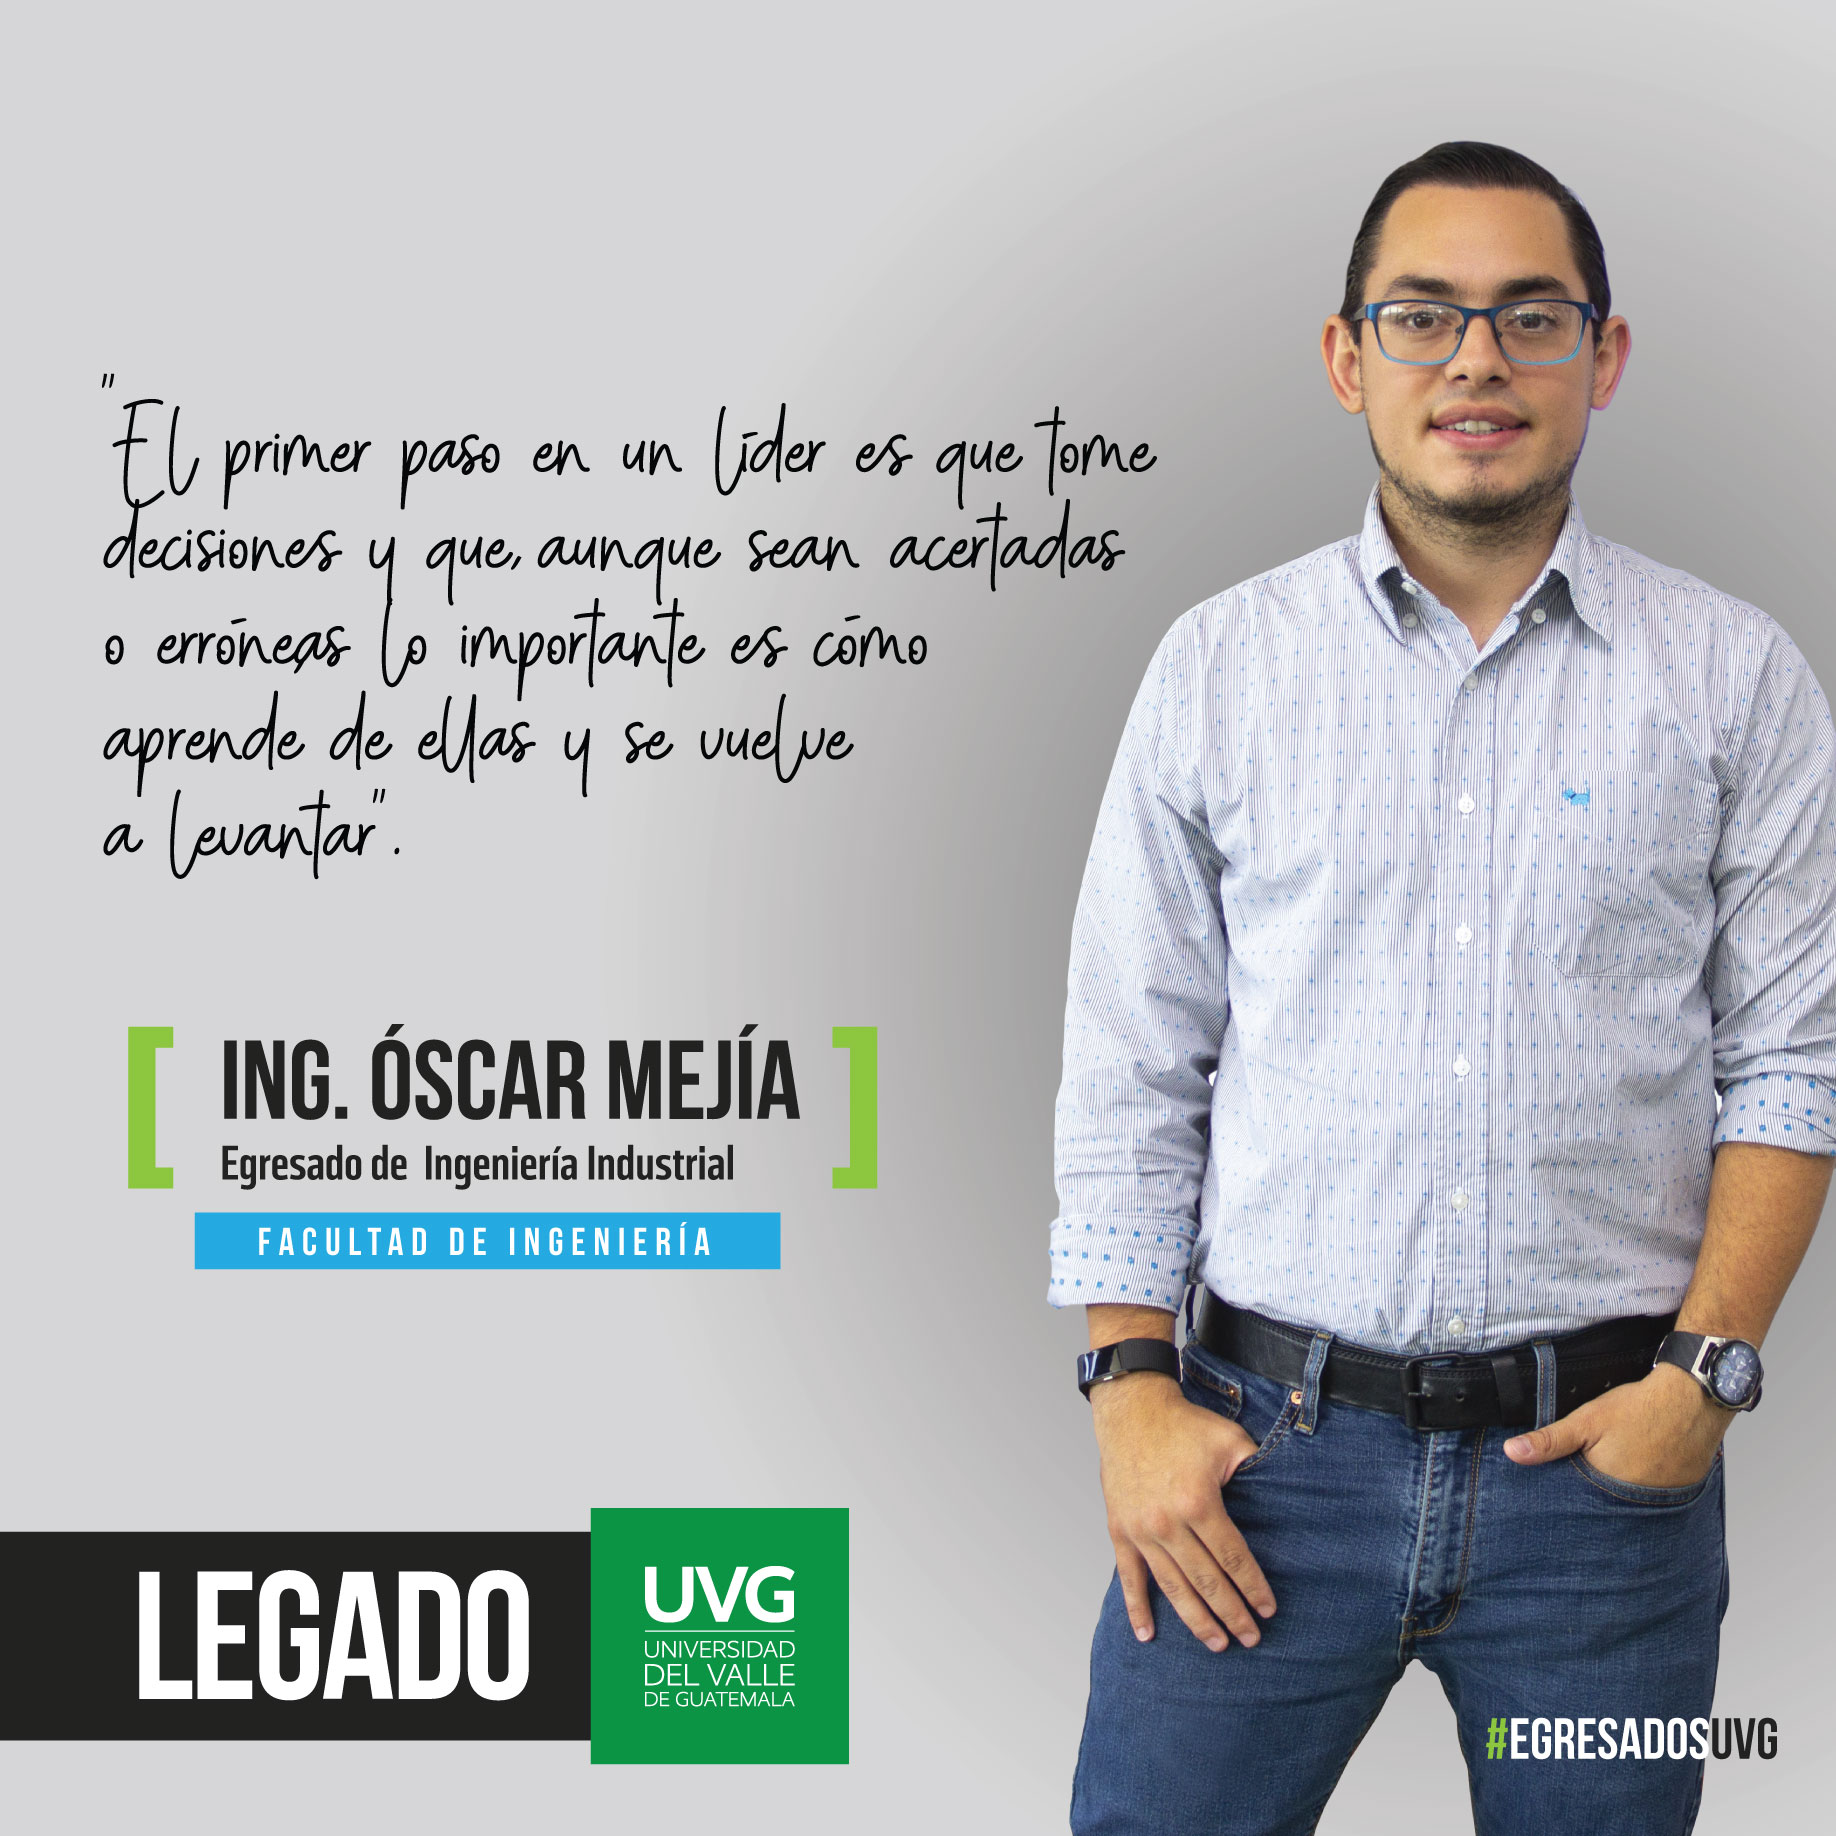 Legado UVG Ing. Óscar Mejía